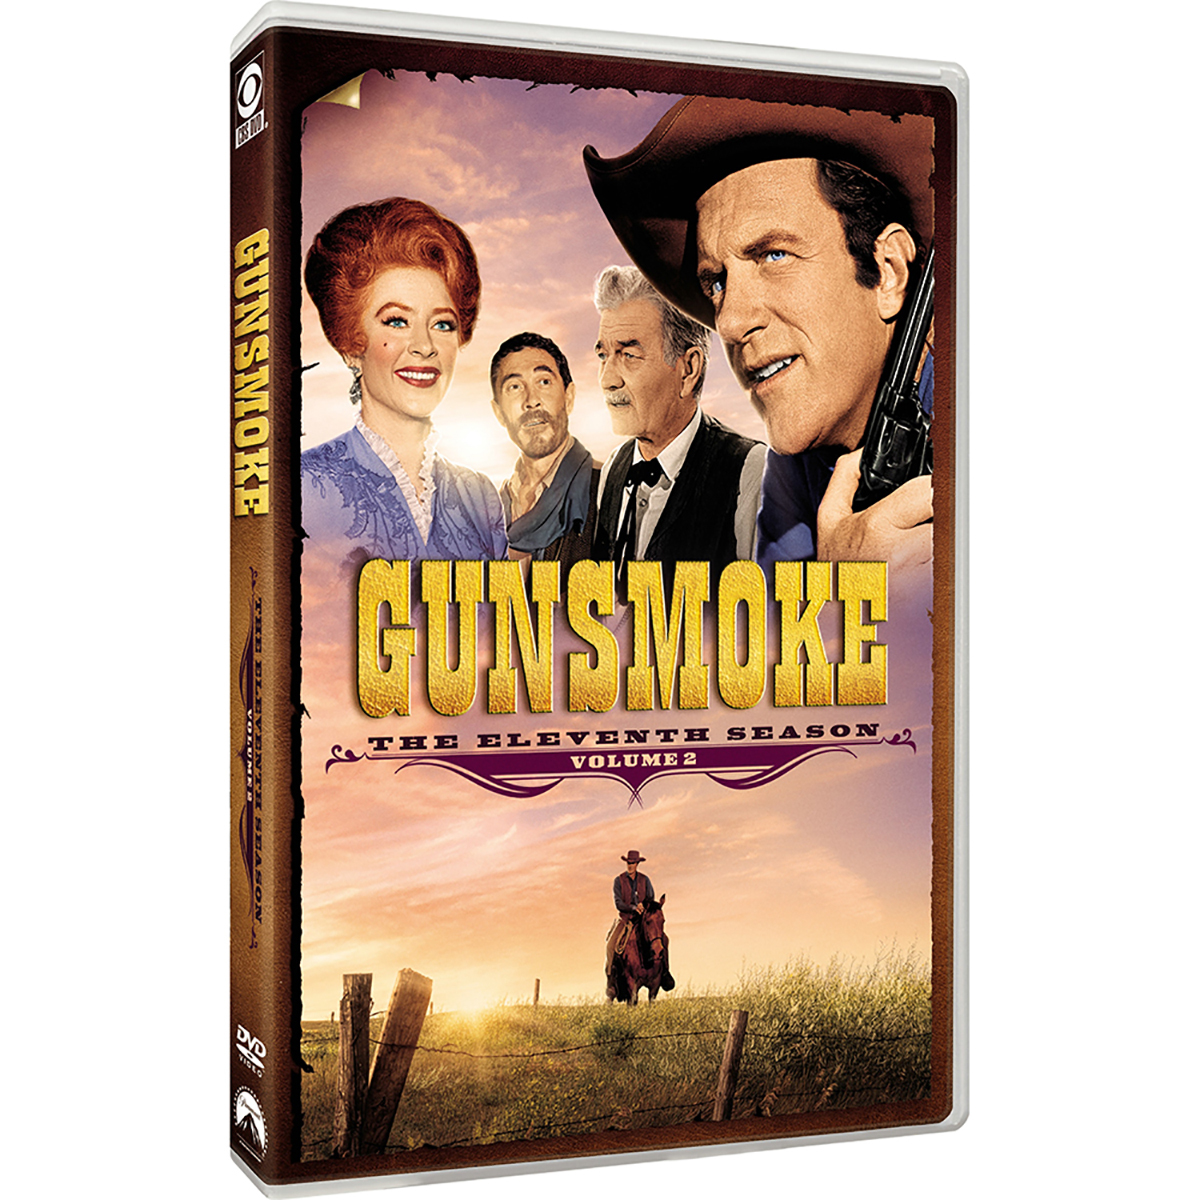 Gunsmoke: Season 11 - Volume 2 DVD -  DVDs & Videos 6445-693722